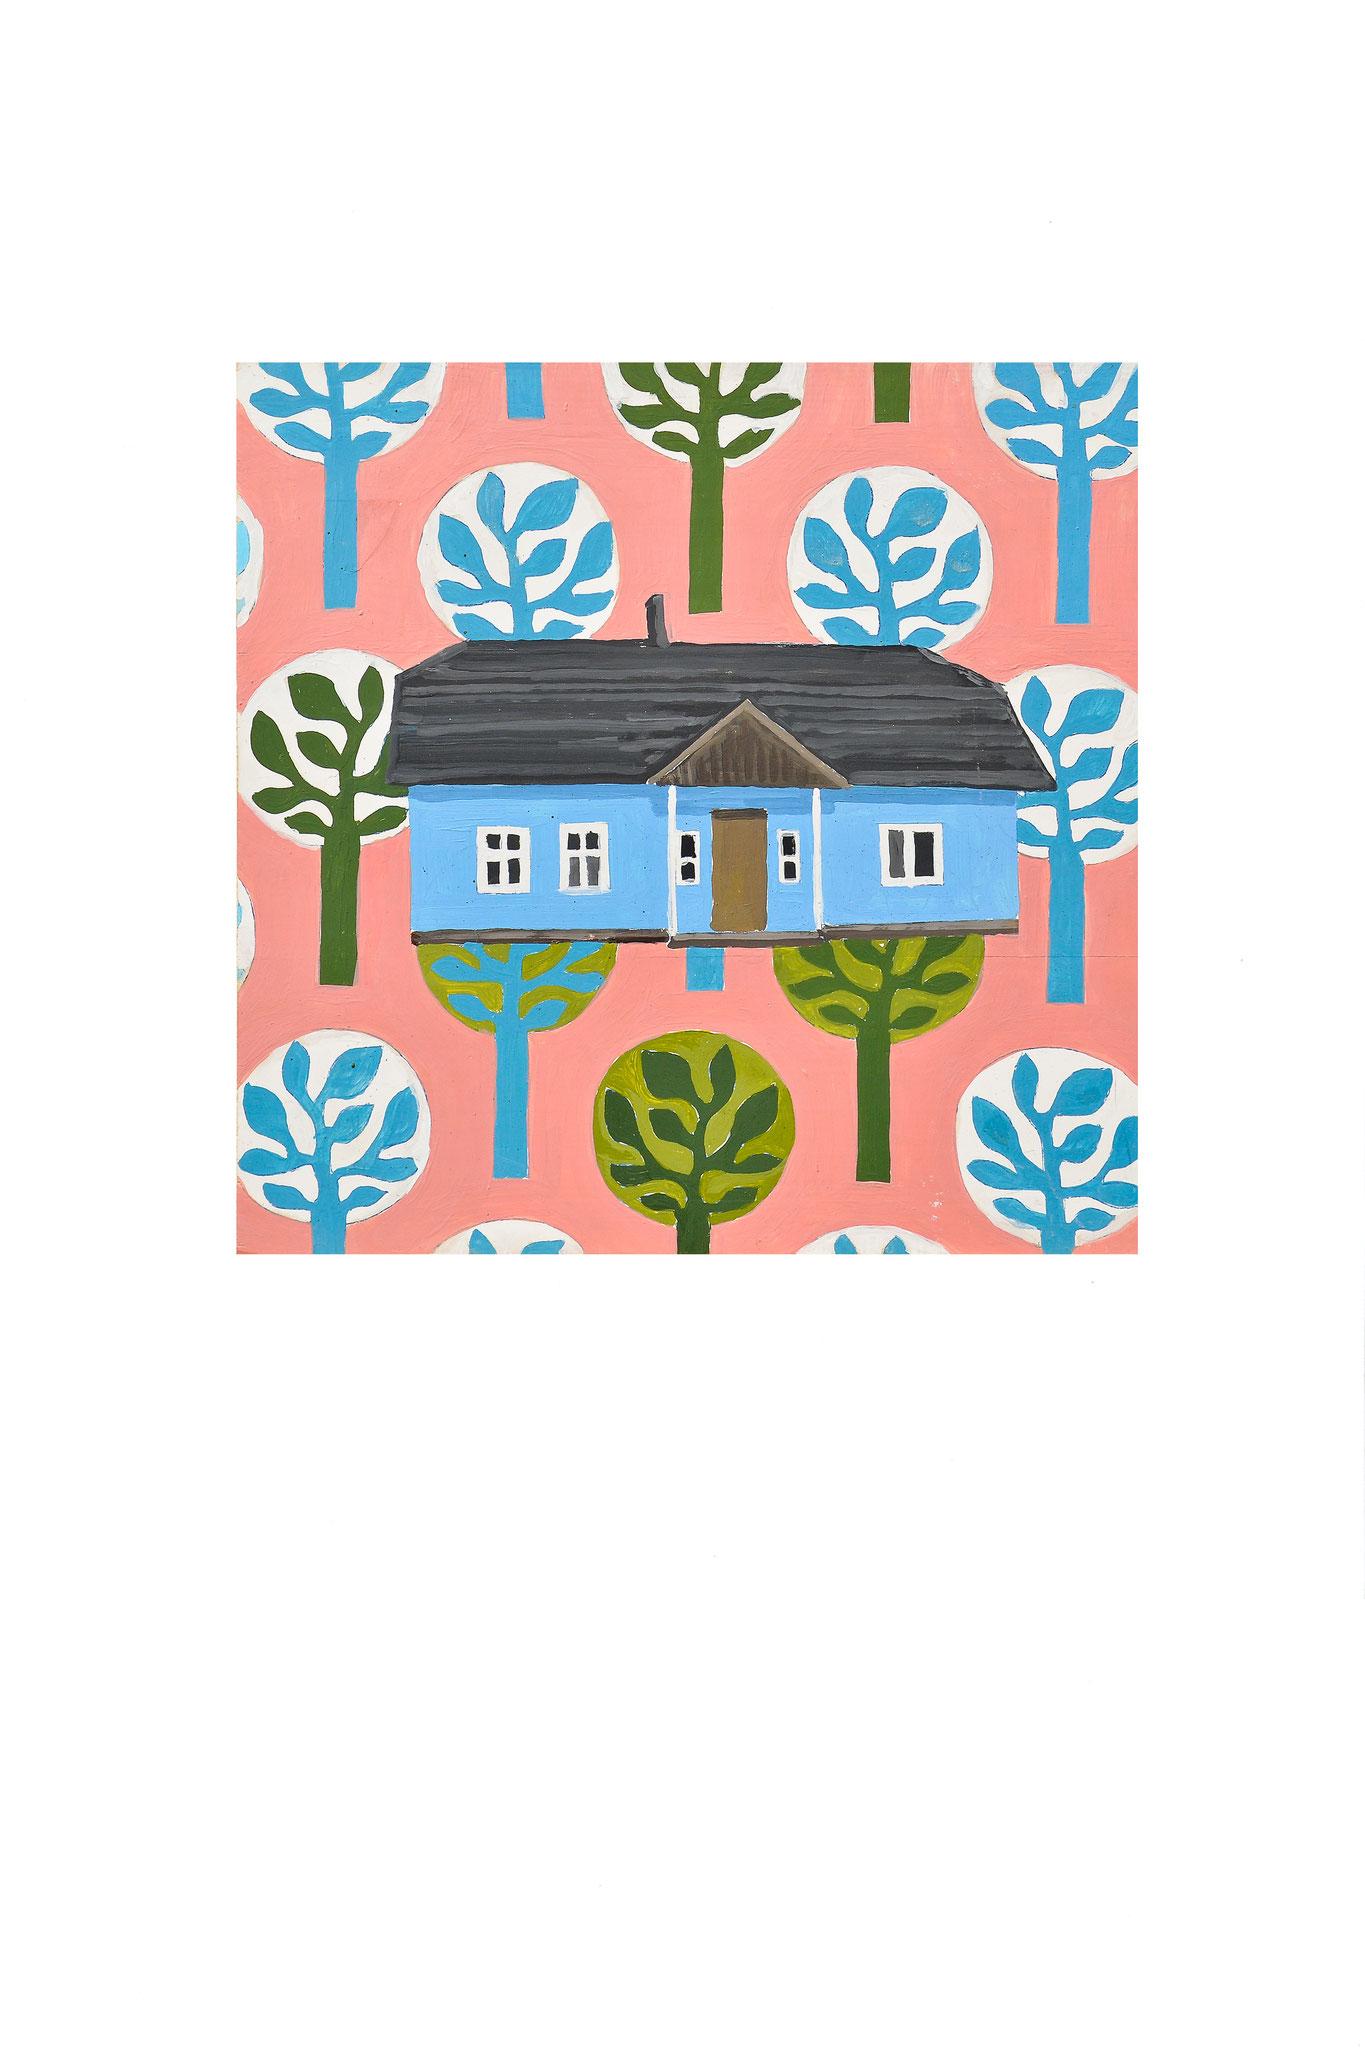 Altes Blaues Märchen Haus Öl auf Holz 30cm x30cm